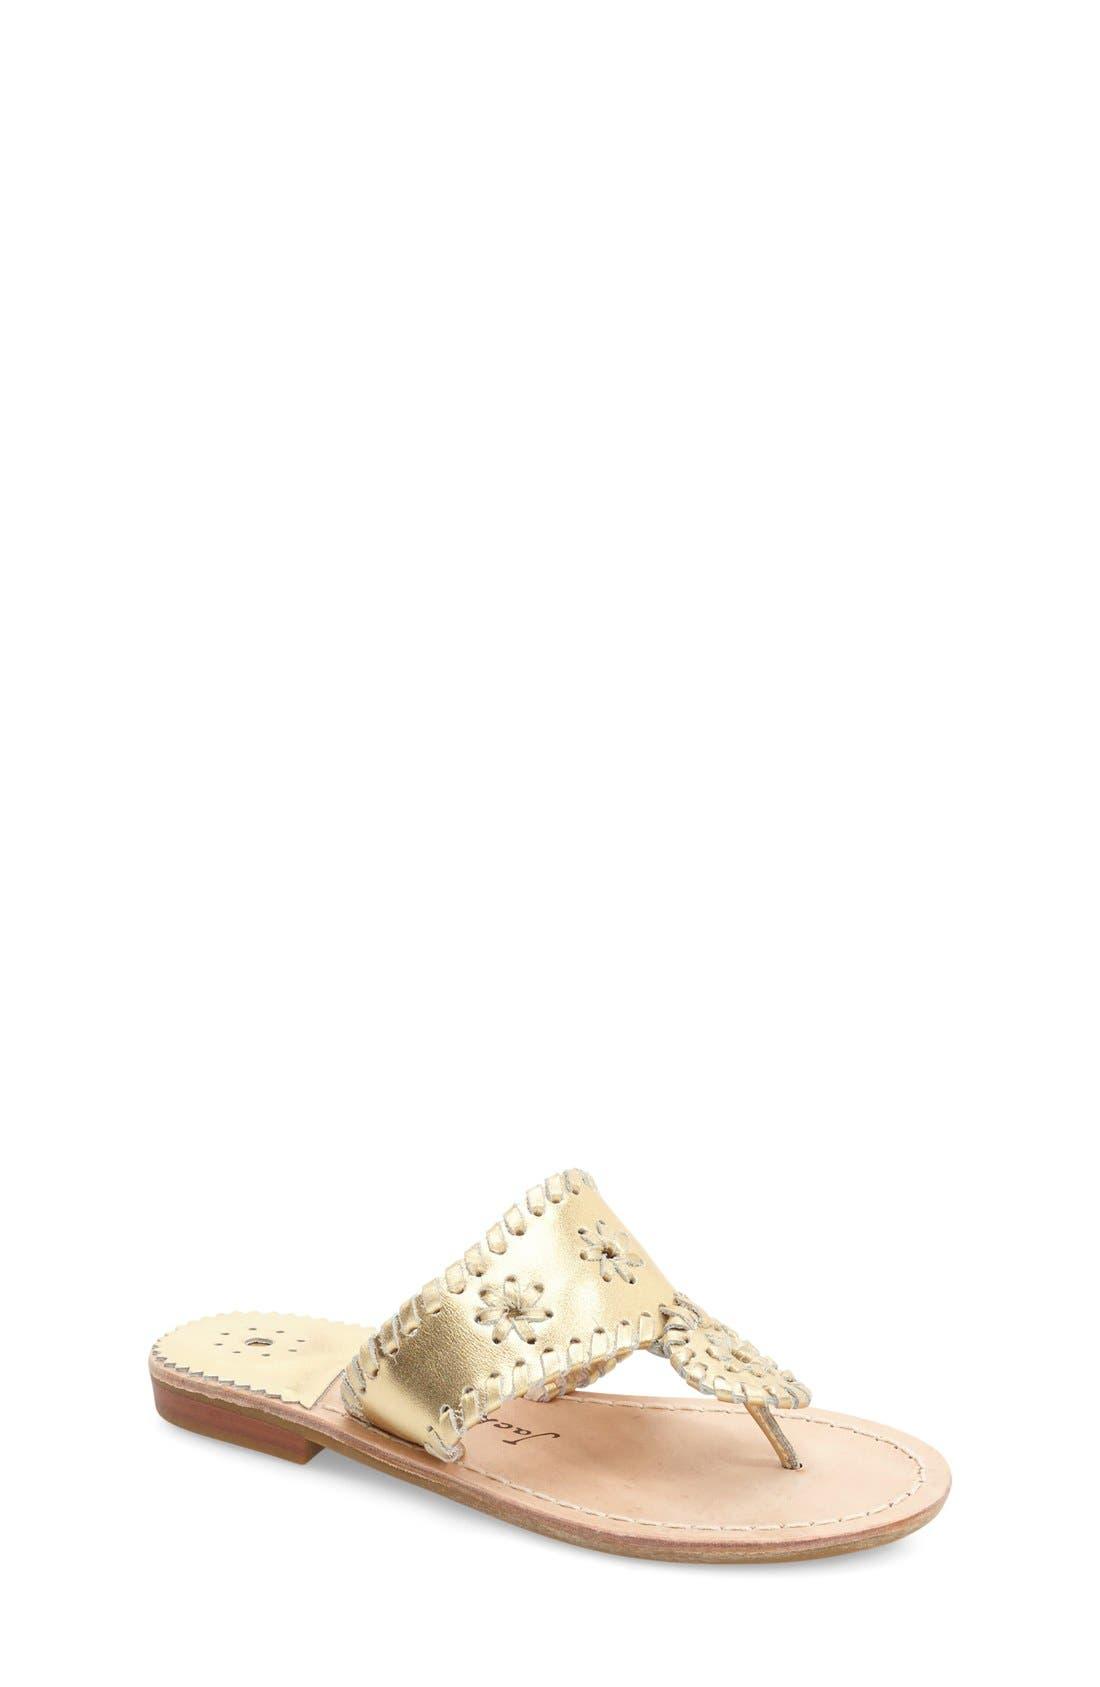 'Miss Hamptons' Sandal,                             Main thumbnail 1, color,                             GOLD